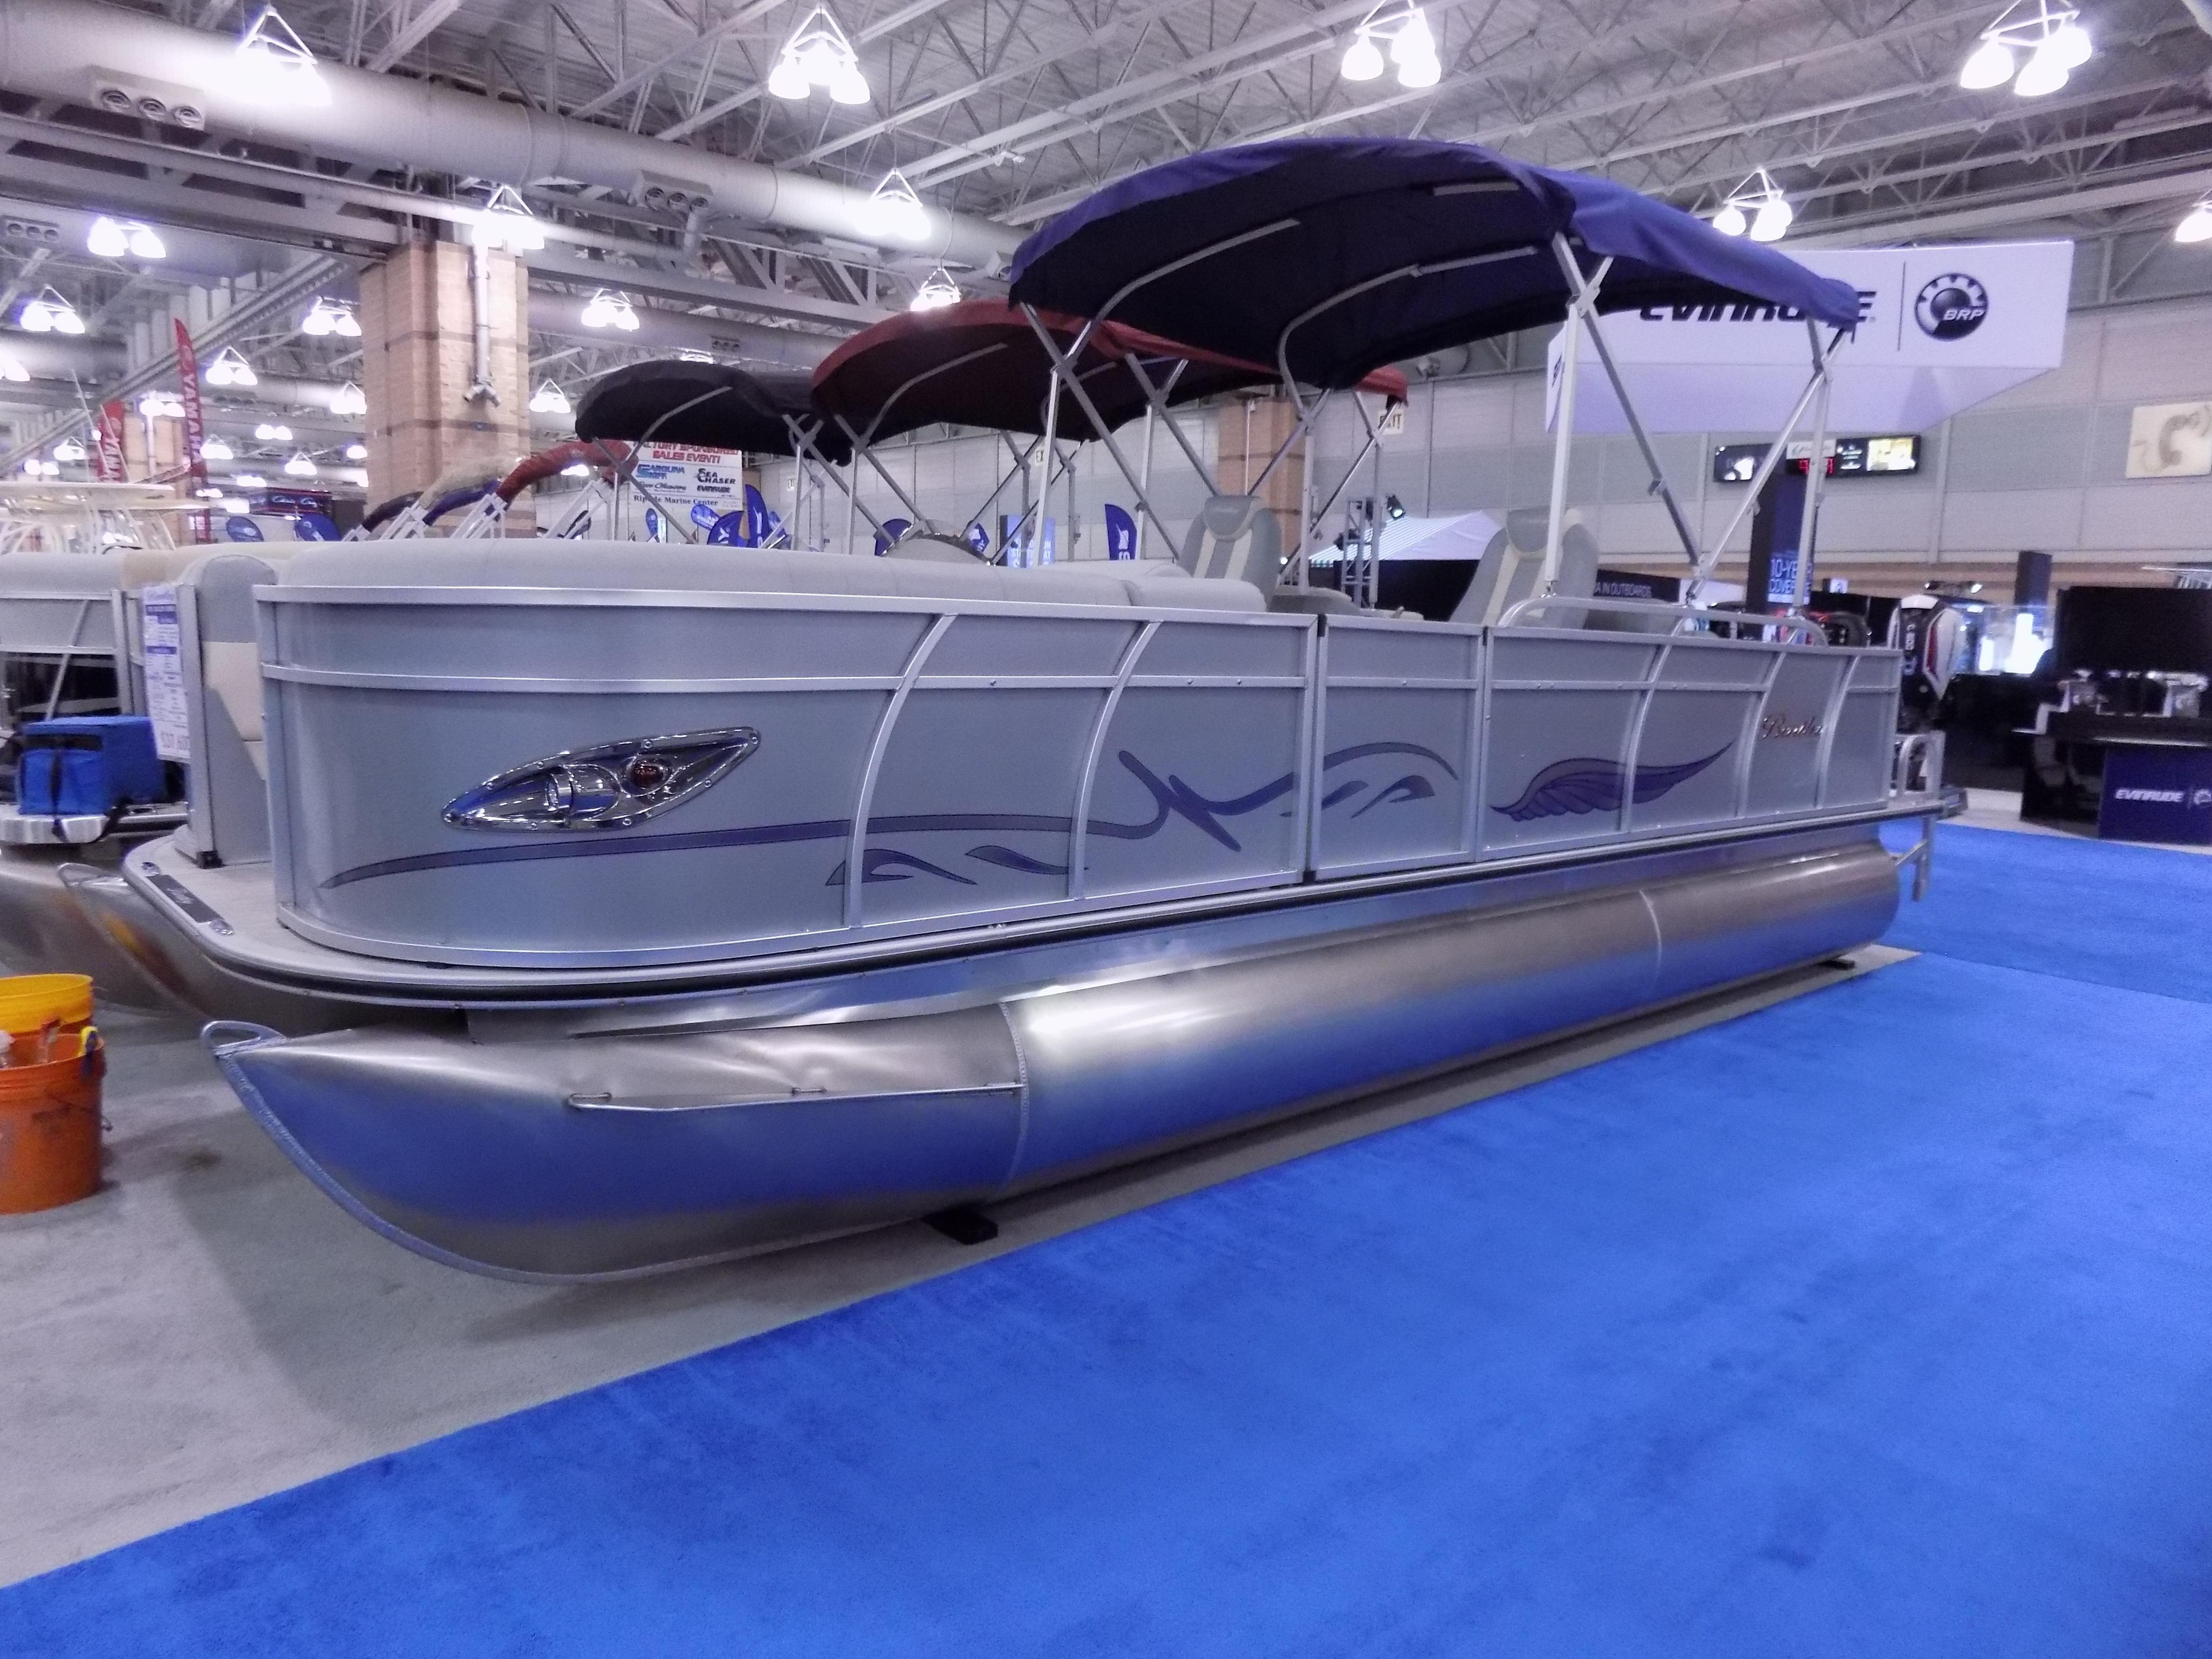 bentley norfolk dealers pontoon outboard va virginia pontoons lounger new power elite in boats rear